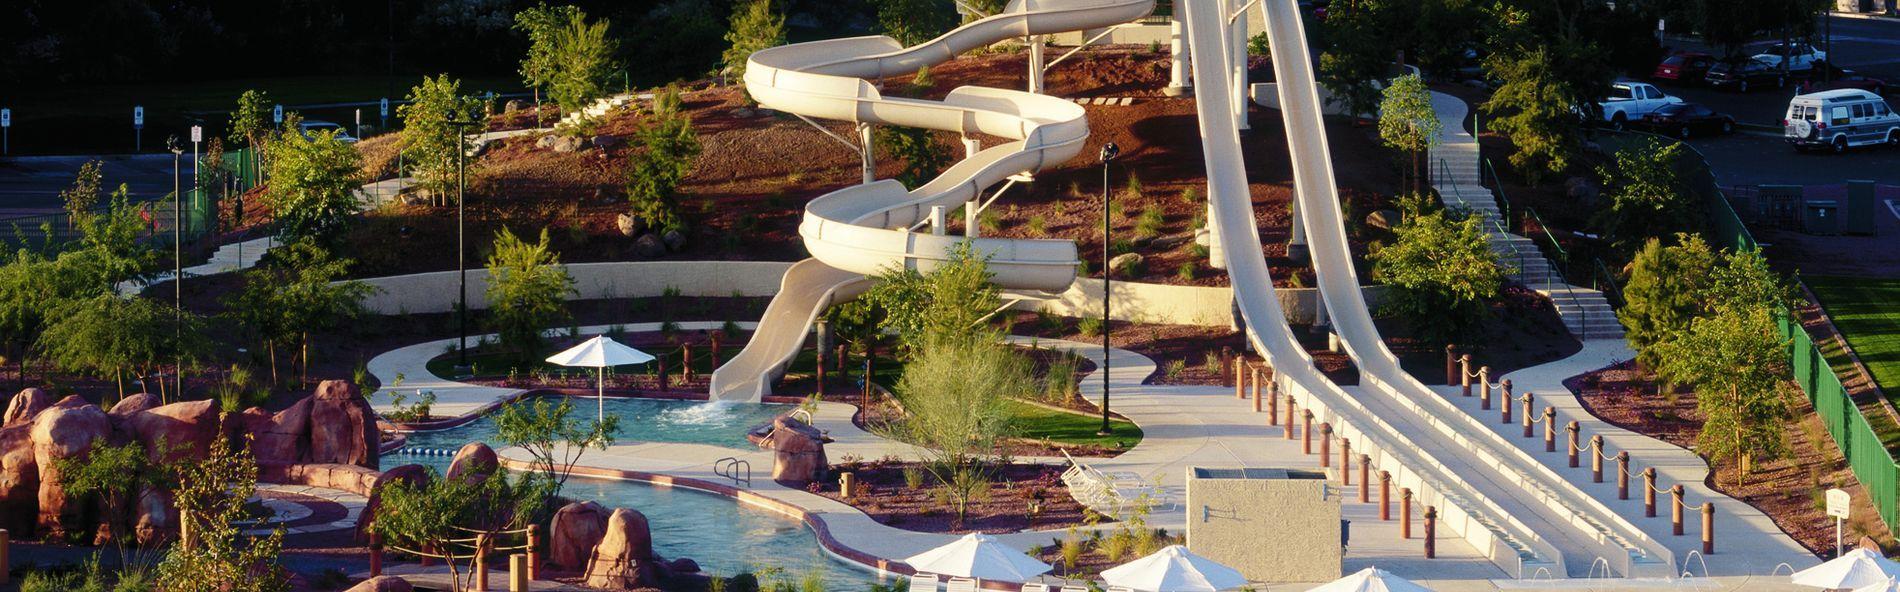 Best Kitchen Gallery: Water Slides At Oasis Water Park Arizona Grand Resort Spa of Az Hotels And Resorts  on rachelxblog.com